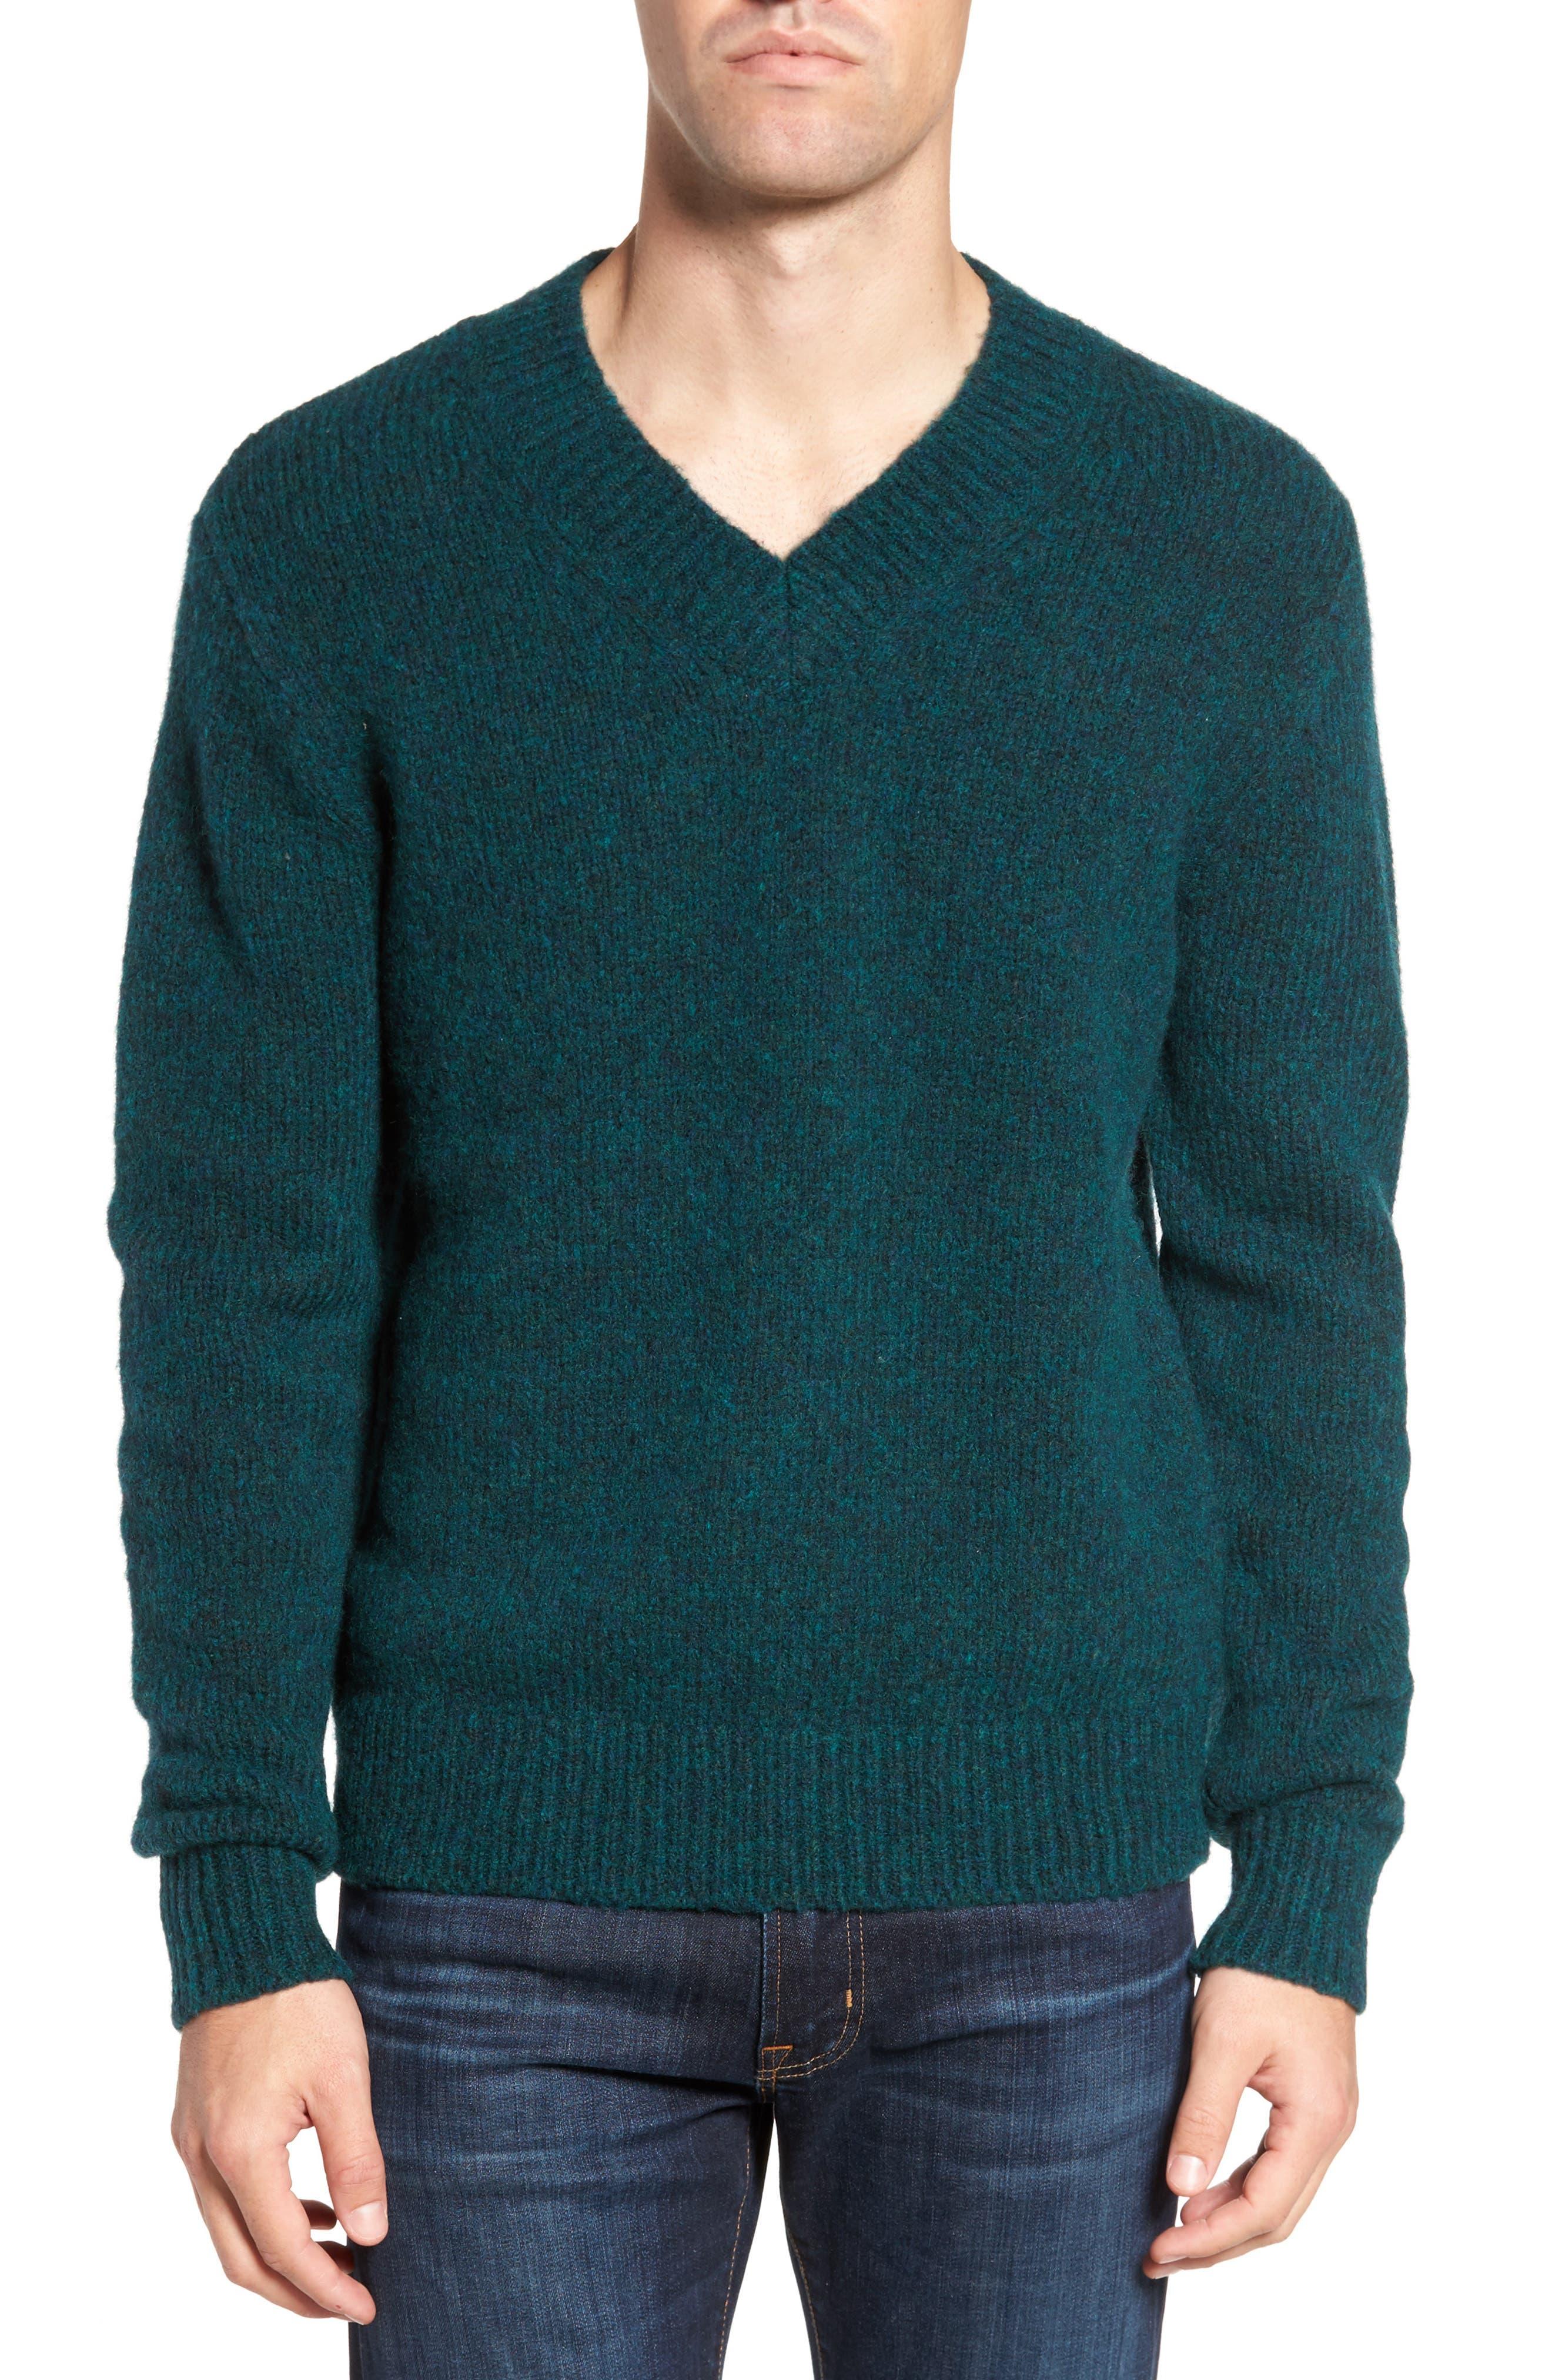 Main Image - Bonobos Fuzzy Deep V-Neck Wool Blend Sweater